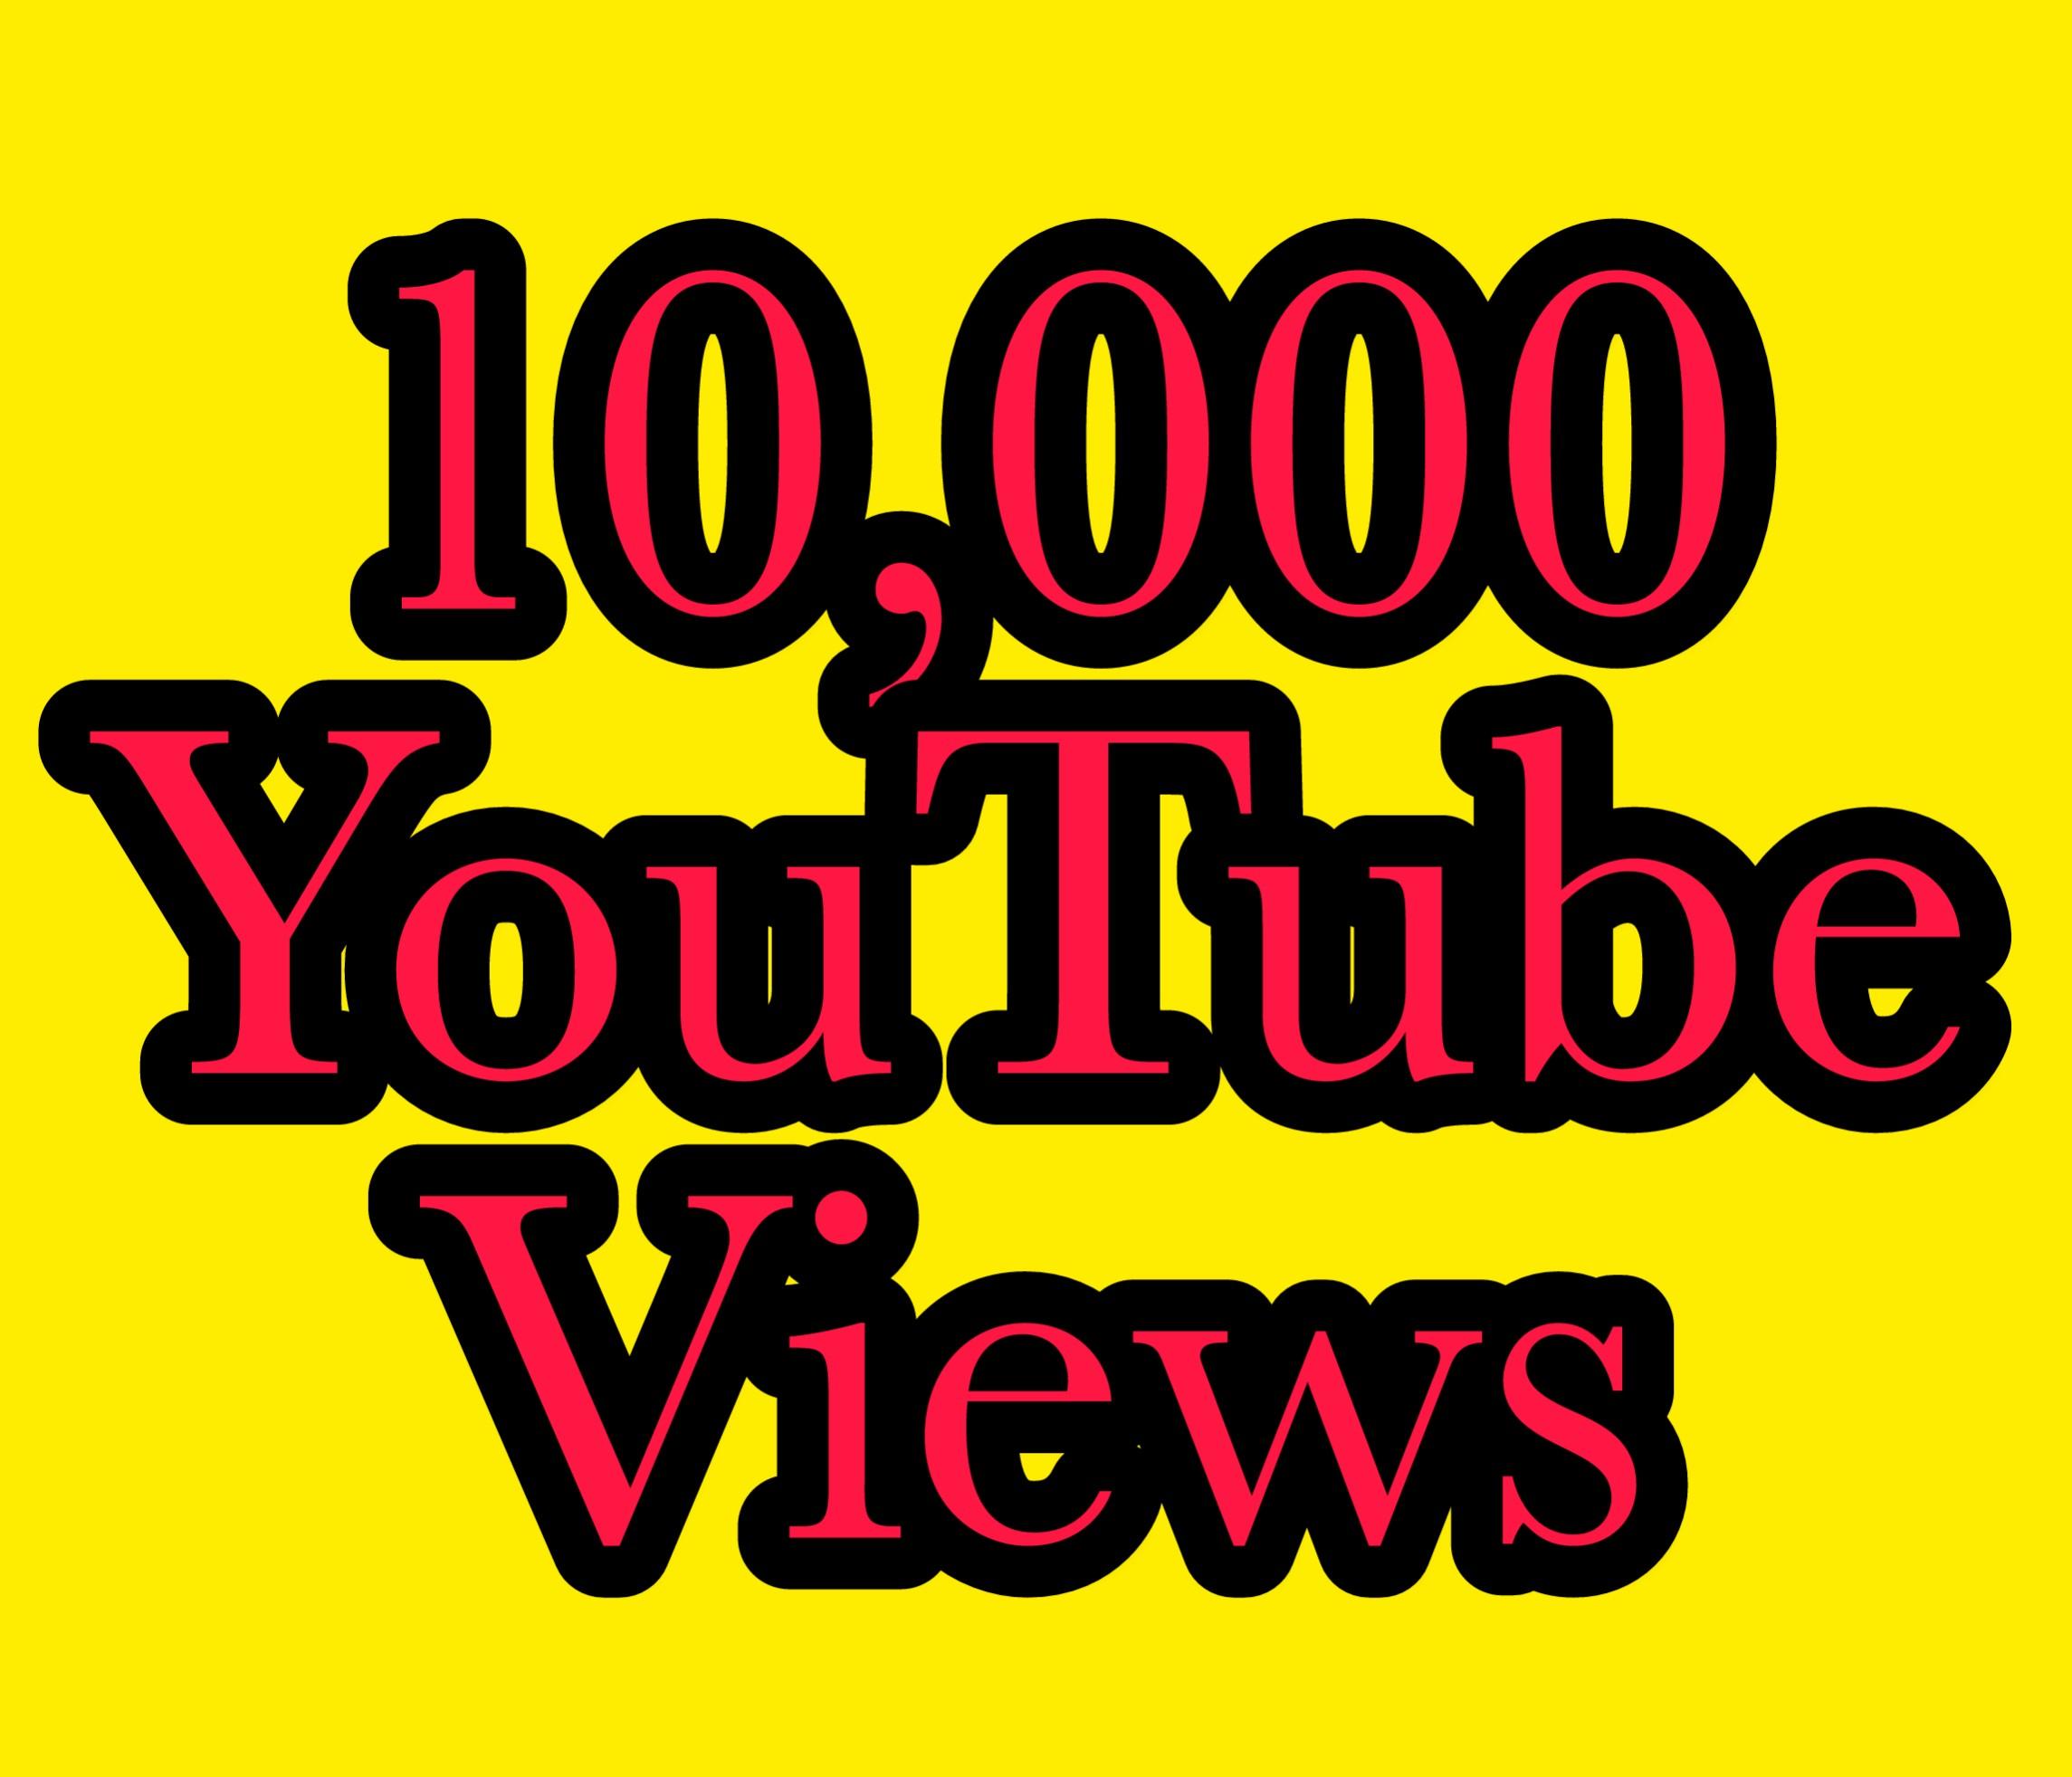 10,000+ You Tube vie ws nondrop guaranteed super fast delivery